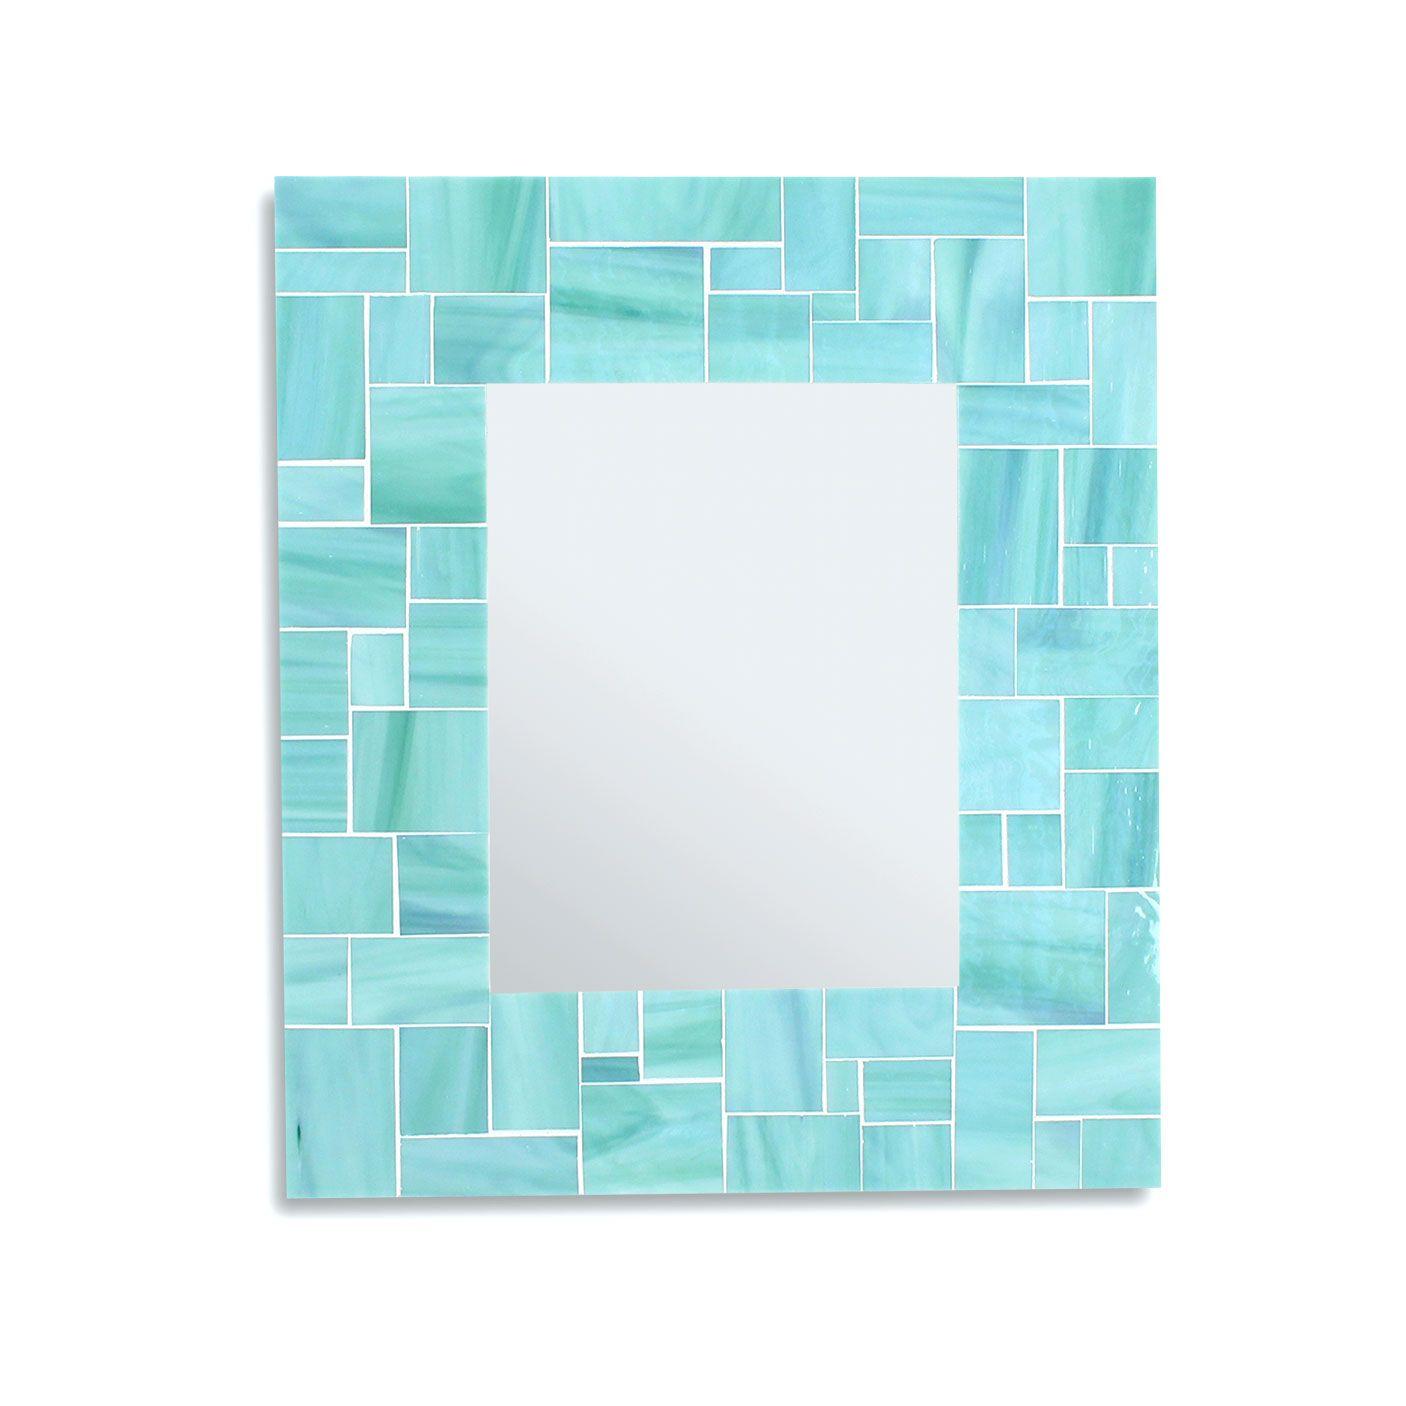 Green Glass Tile Bathroom: Buy Hand Crafted Decorative Sea Green Mosaic Bathroom Wall